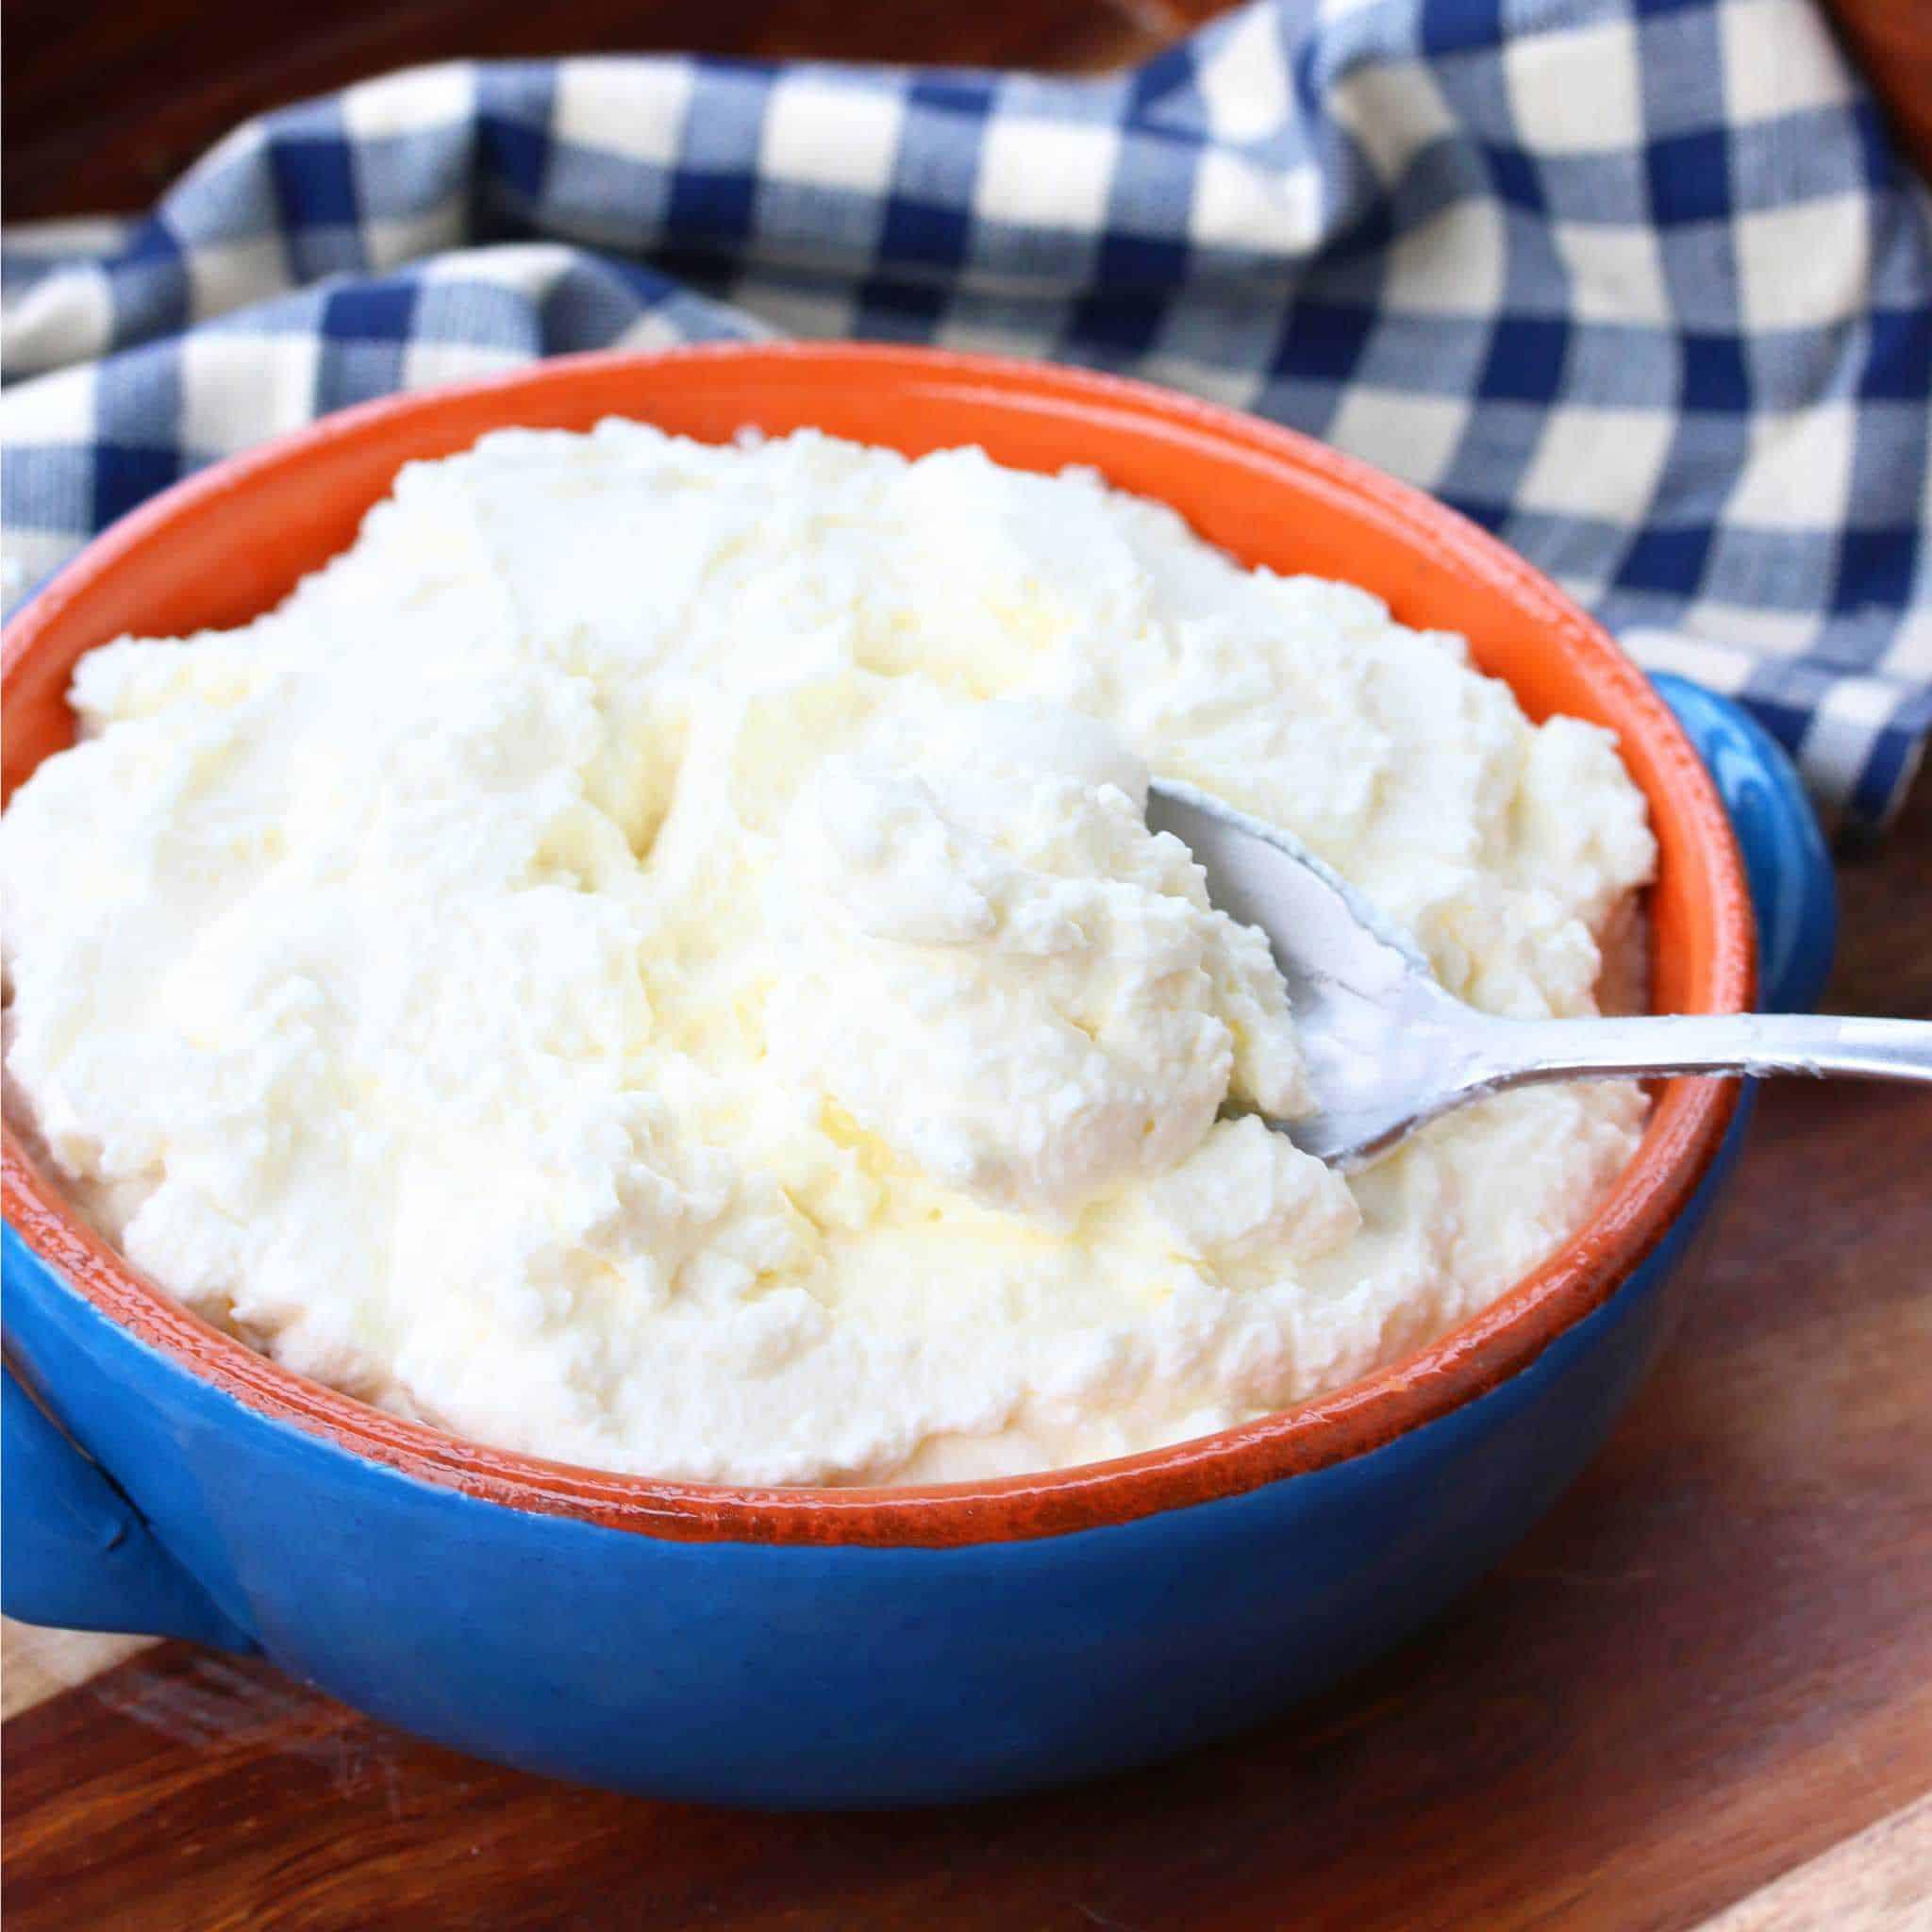 How To Make Quark Cheese The Daring Gourmet